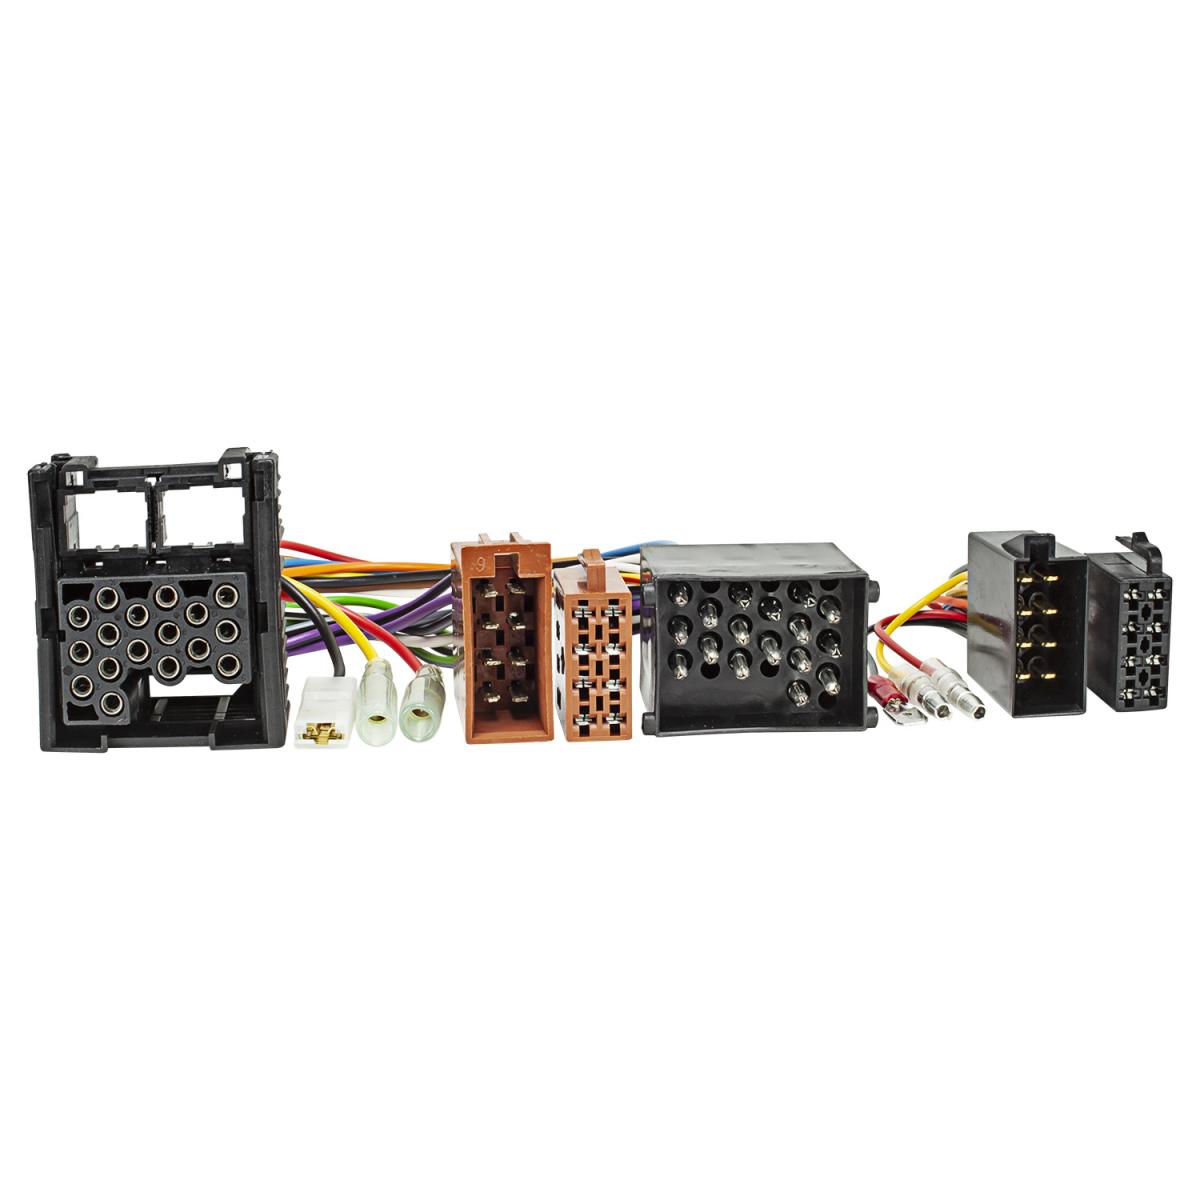 ISO DIN Kabel passend für Land Rover Defender 2 ab 2001 Rundpin Radioadapter